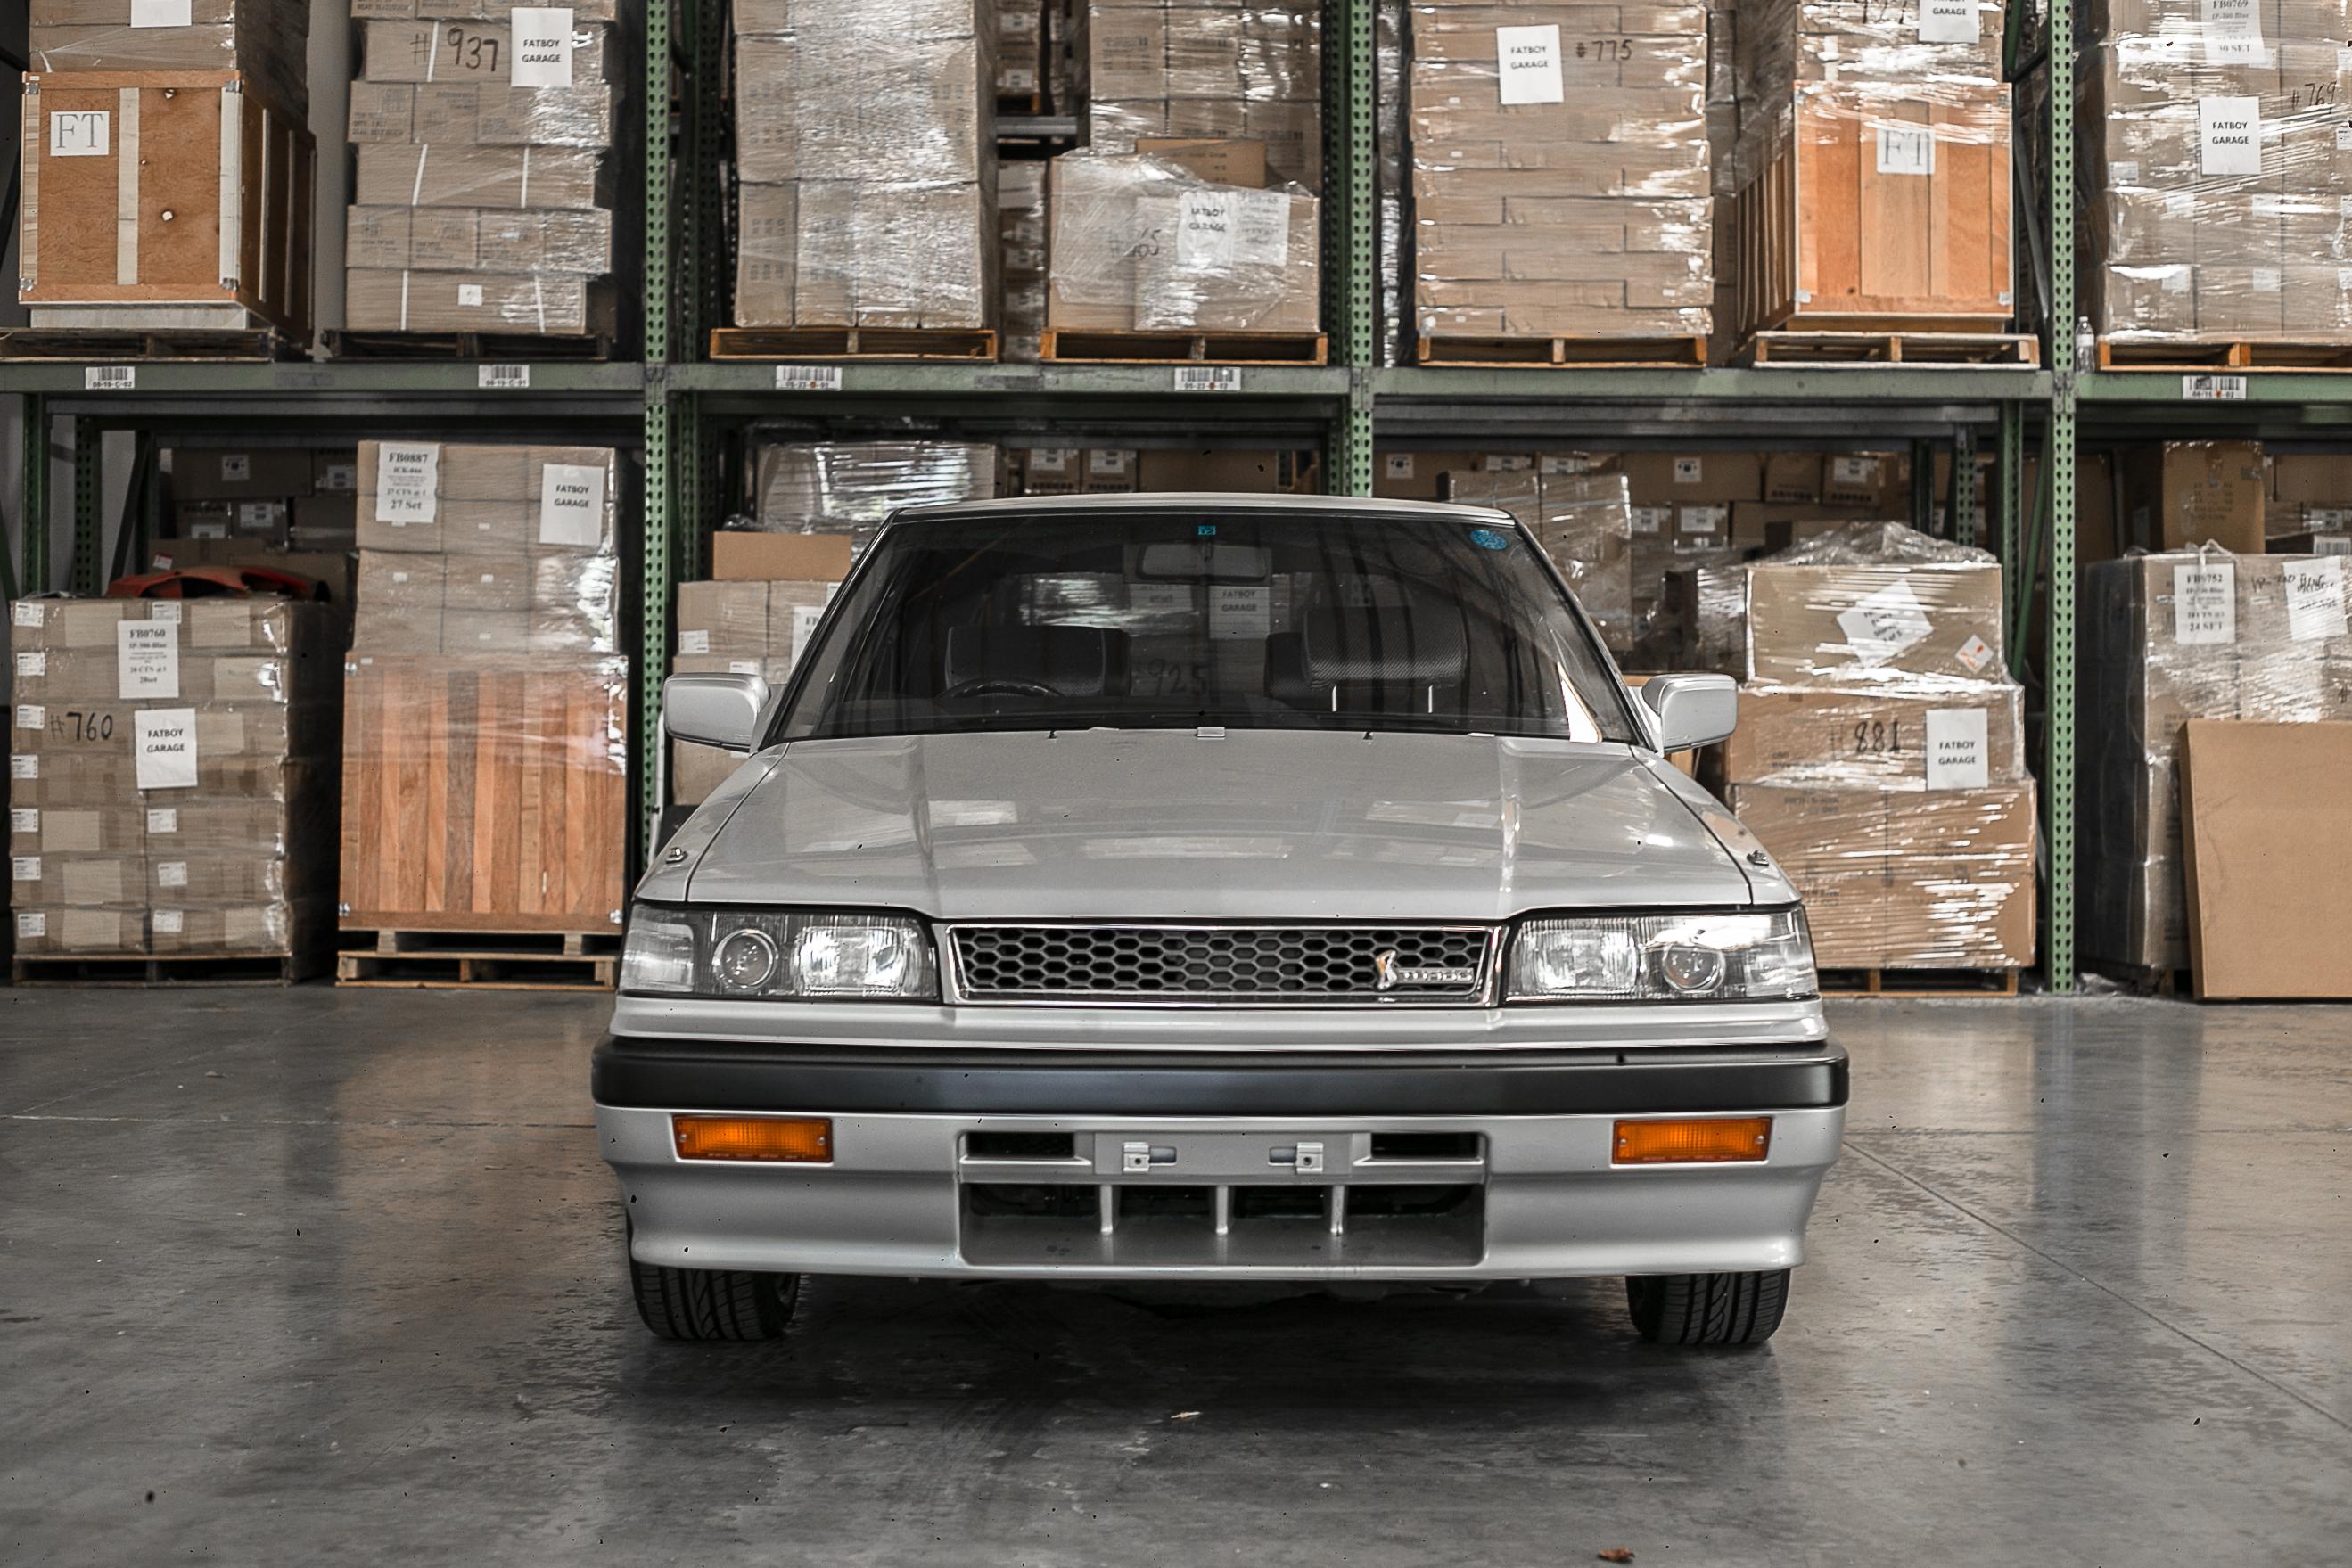 Nissan R31 Skyline turbo wagon front